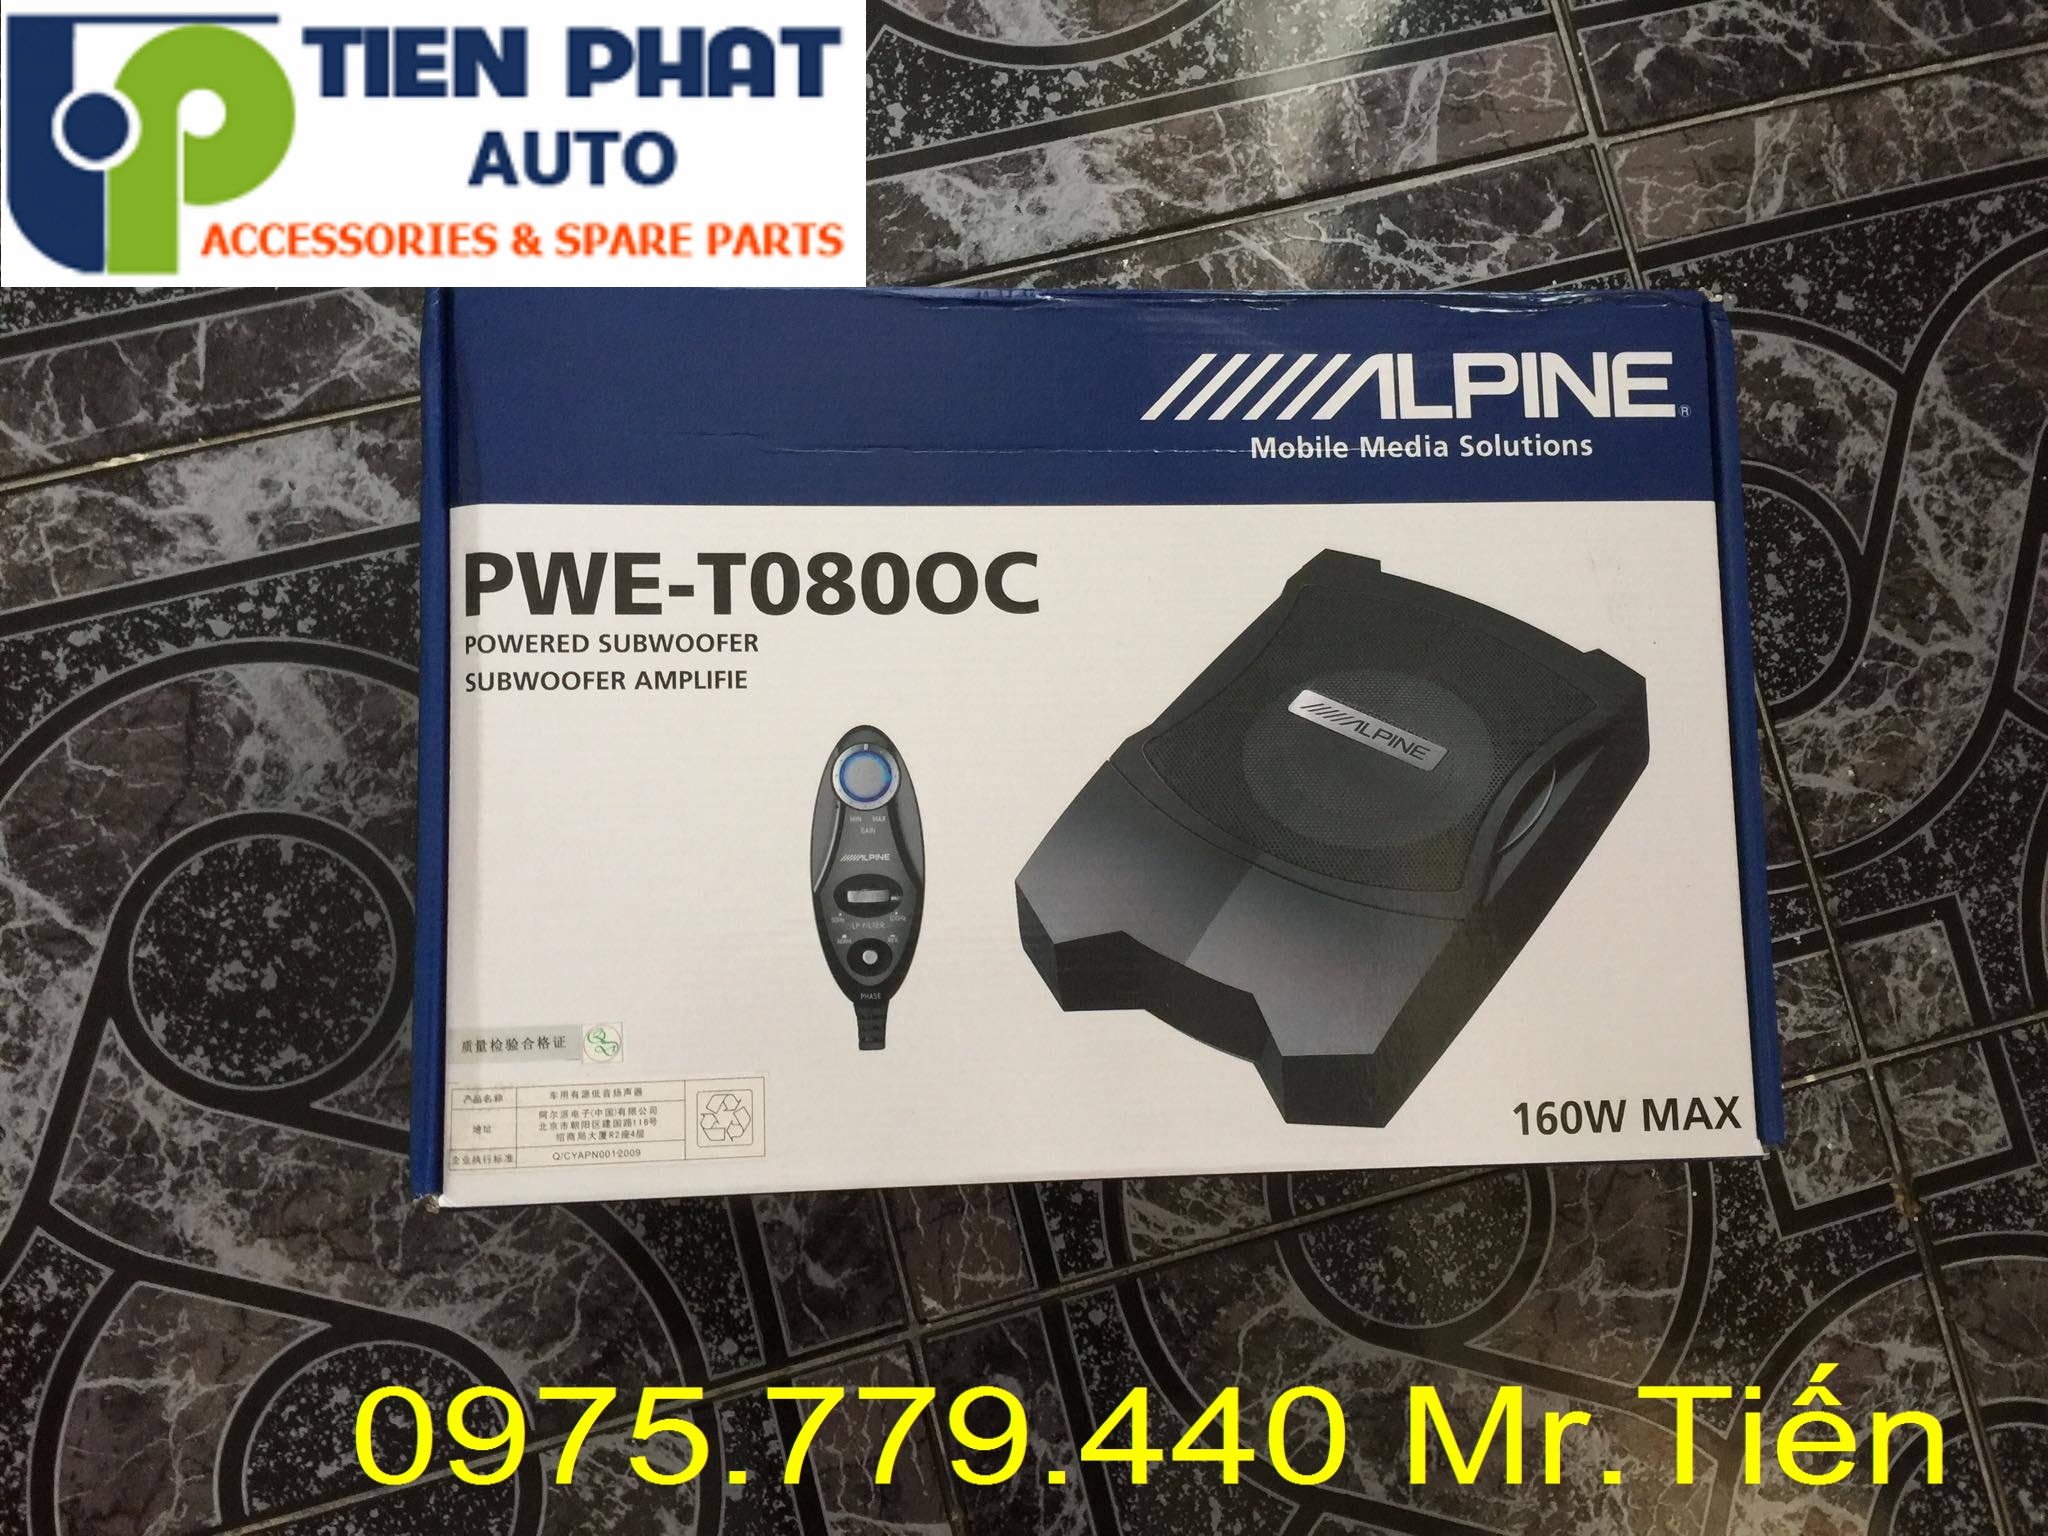 Lắp Loa sub Alpine PWE-T0800C cho Kia Carens Lắp Đặt Tận Nơi